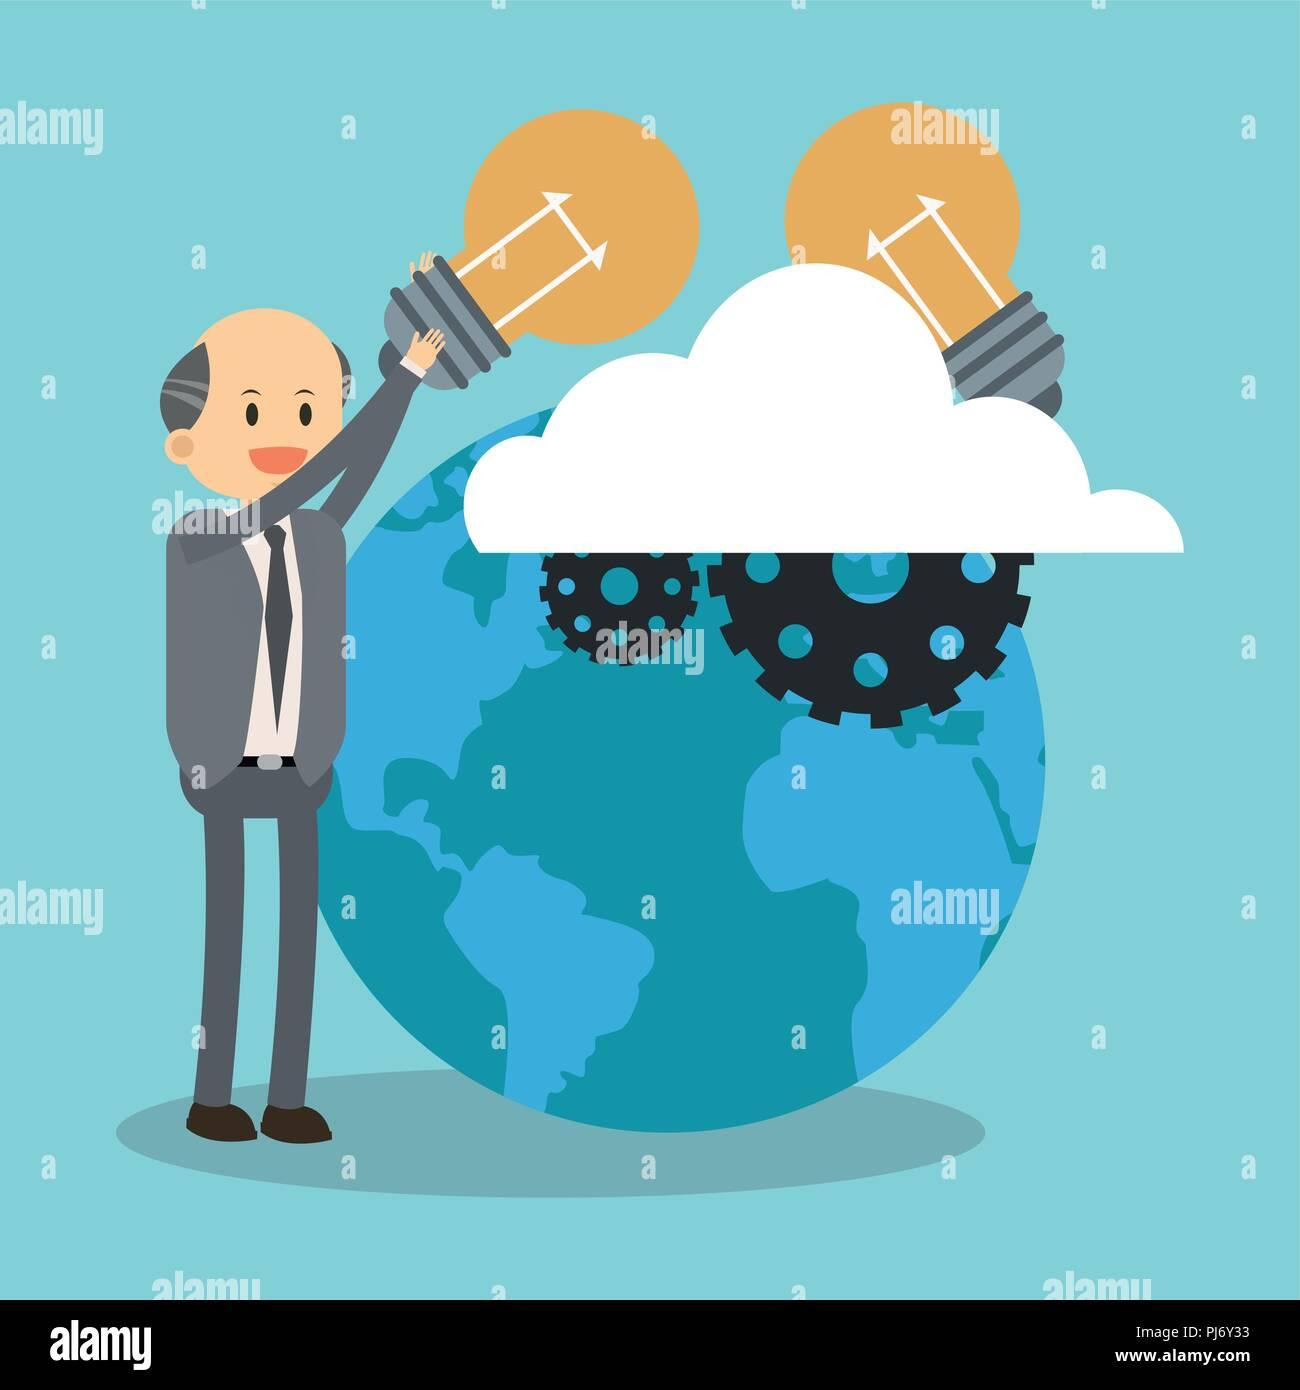 Businessman and big idea - Stock Image